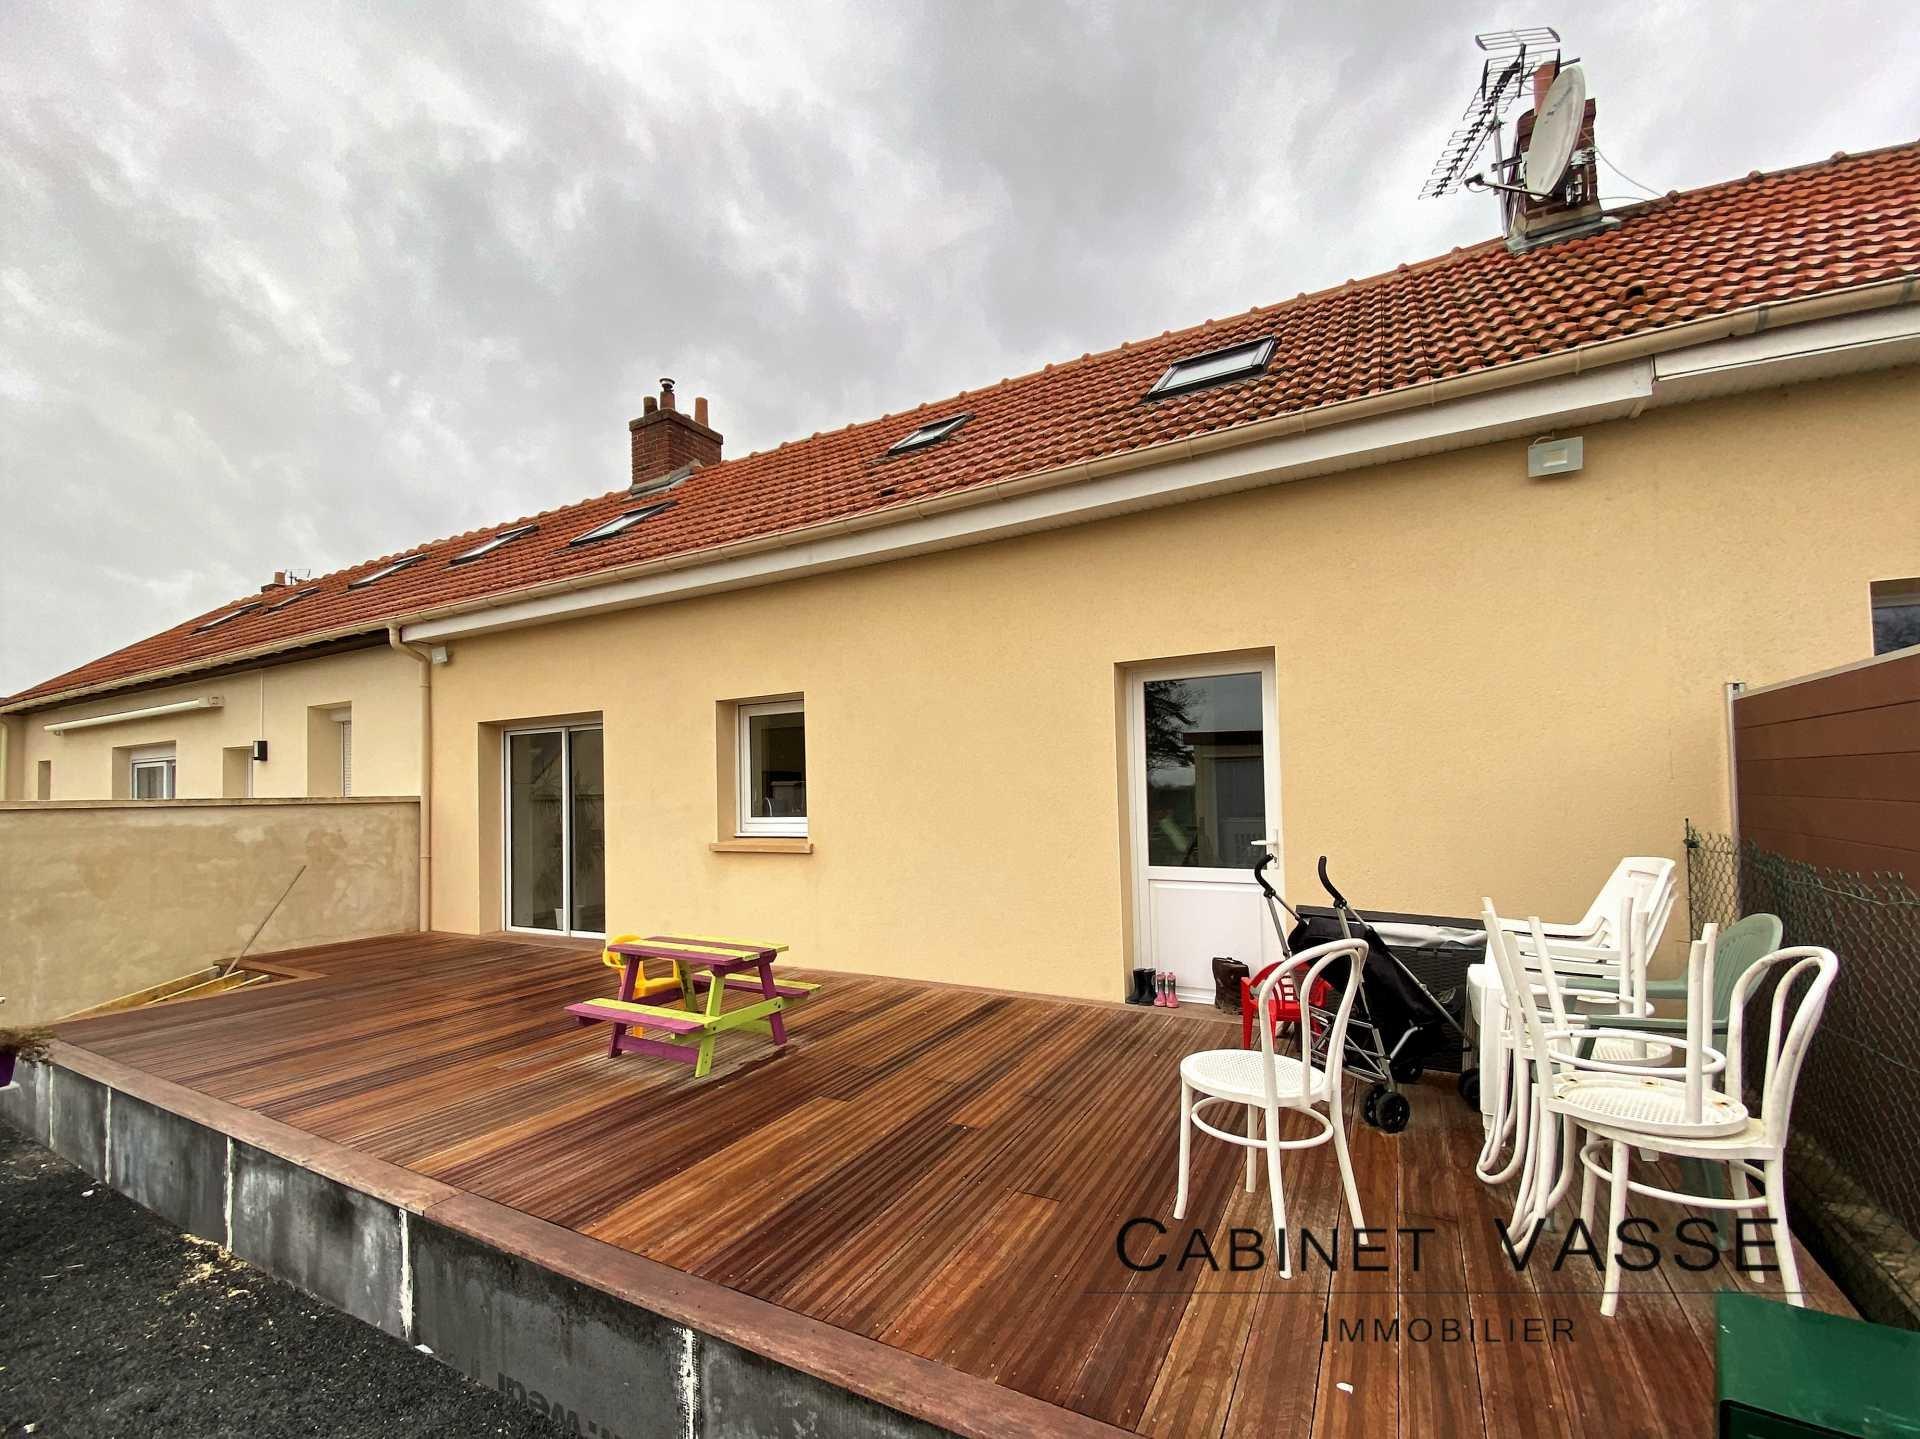 maison, jardin, terrasse, bois, vasse, a vendre